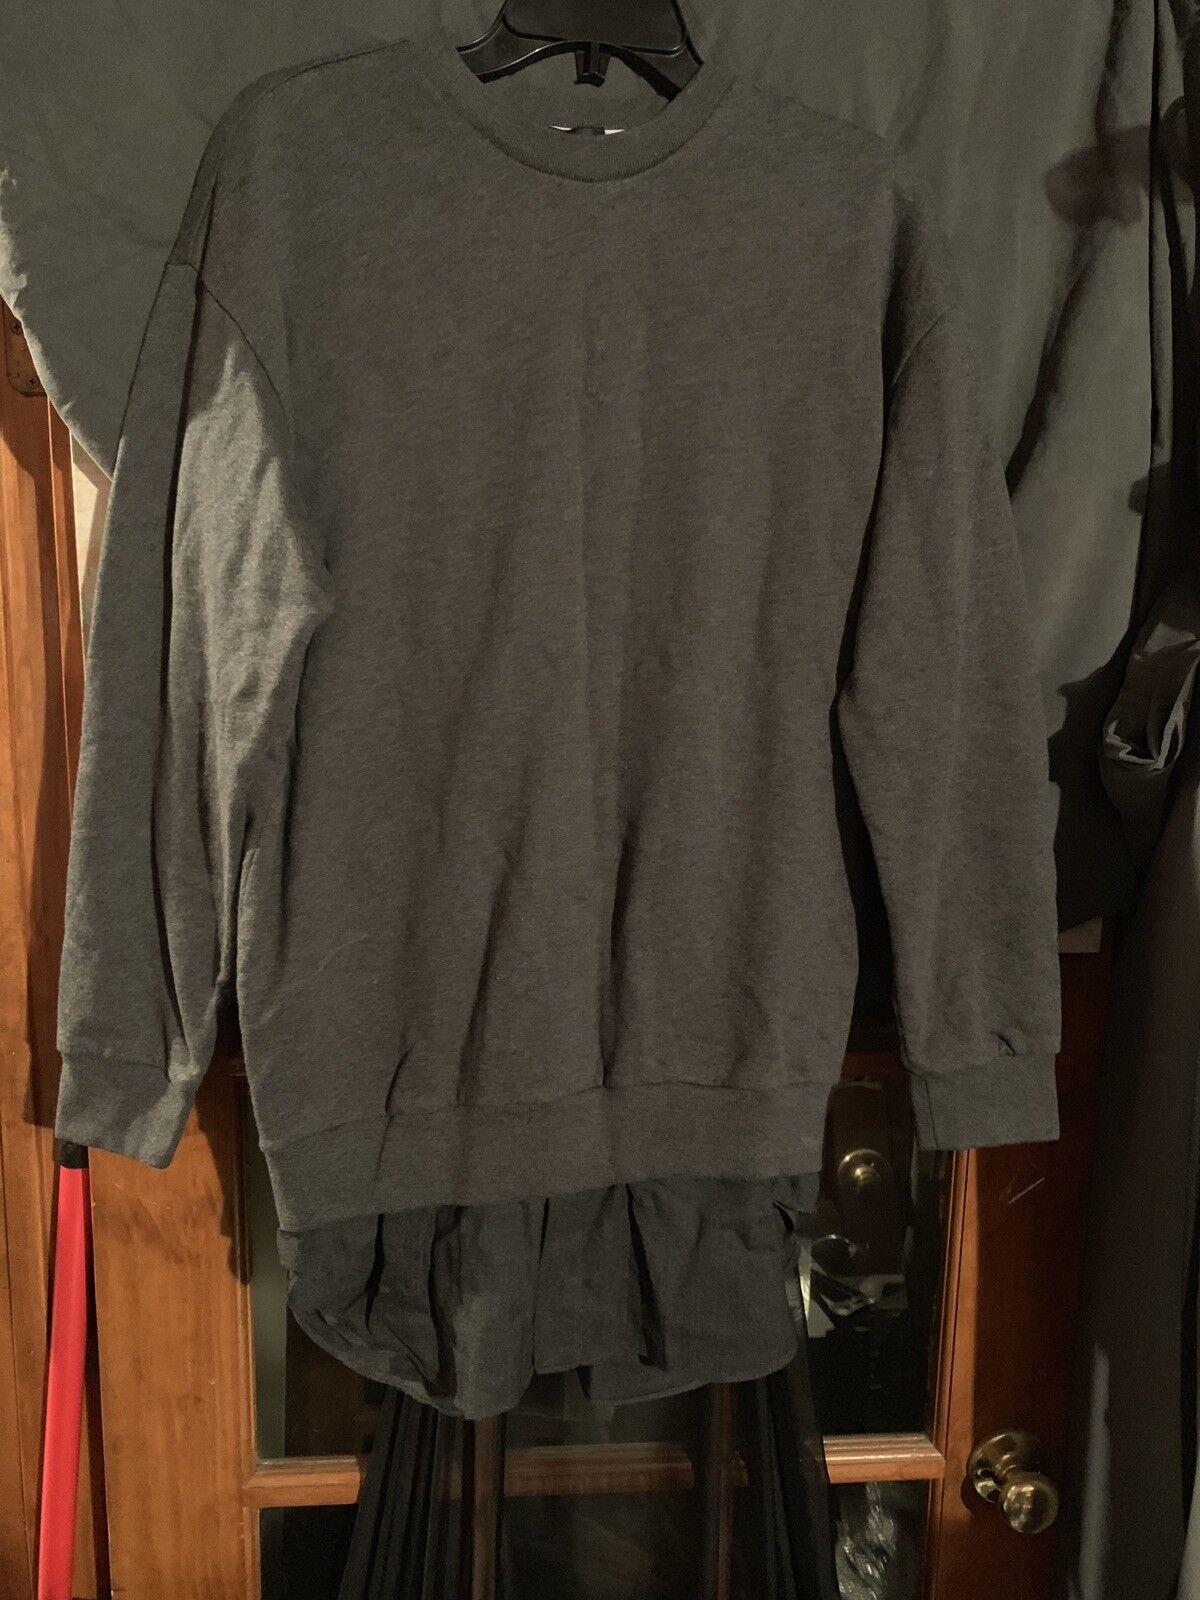 3.1 phillip Lim LayeROT Pullover Sweatshirt Sz Small Retail 365